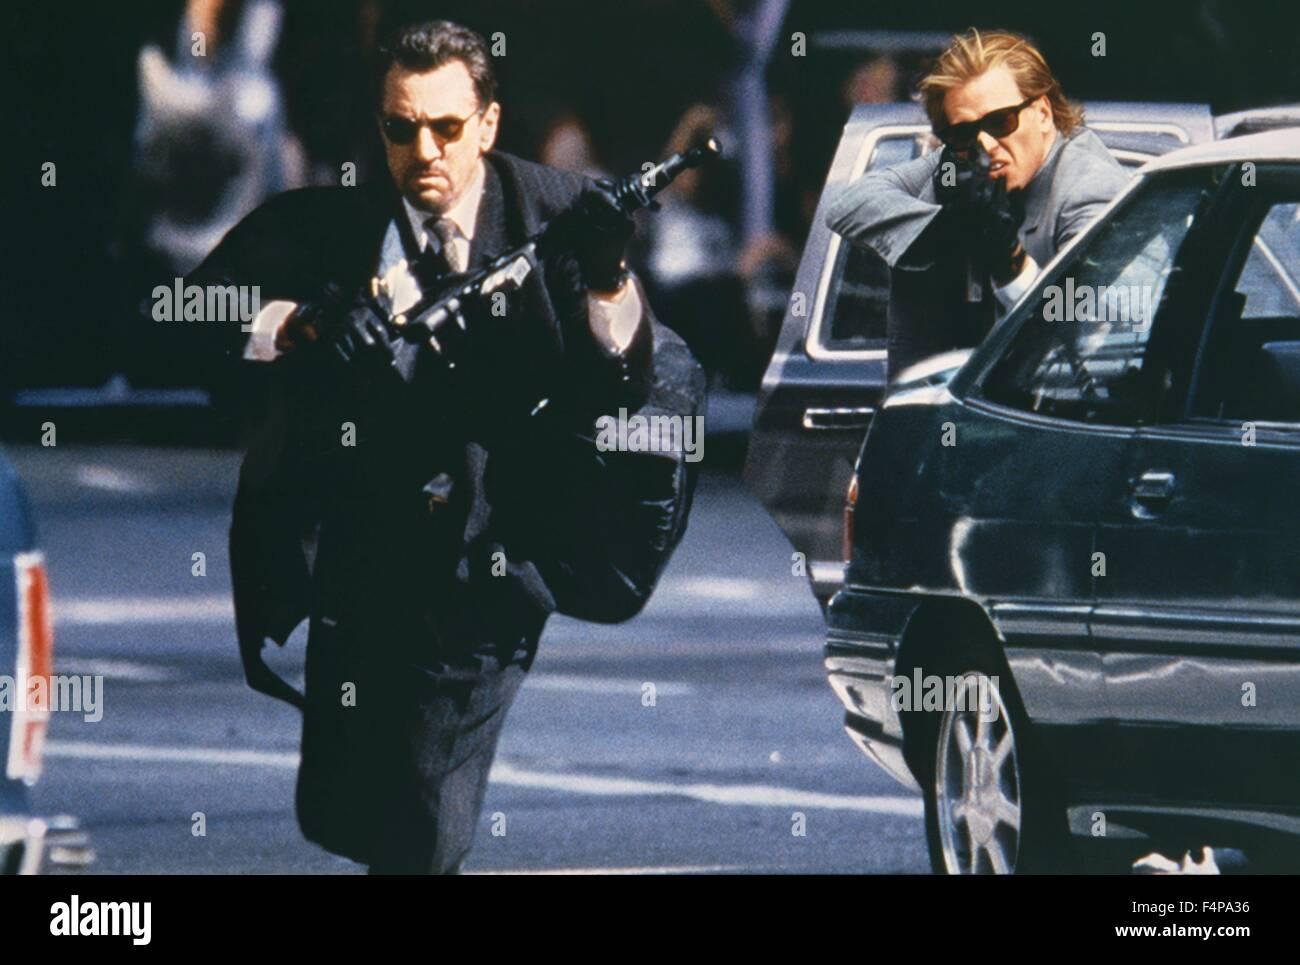 Robert de Niro, Val Kilmer / Heat 1995 directed by Michael Mann - Stock Image